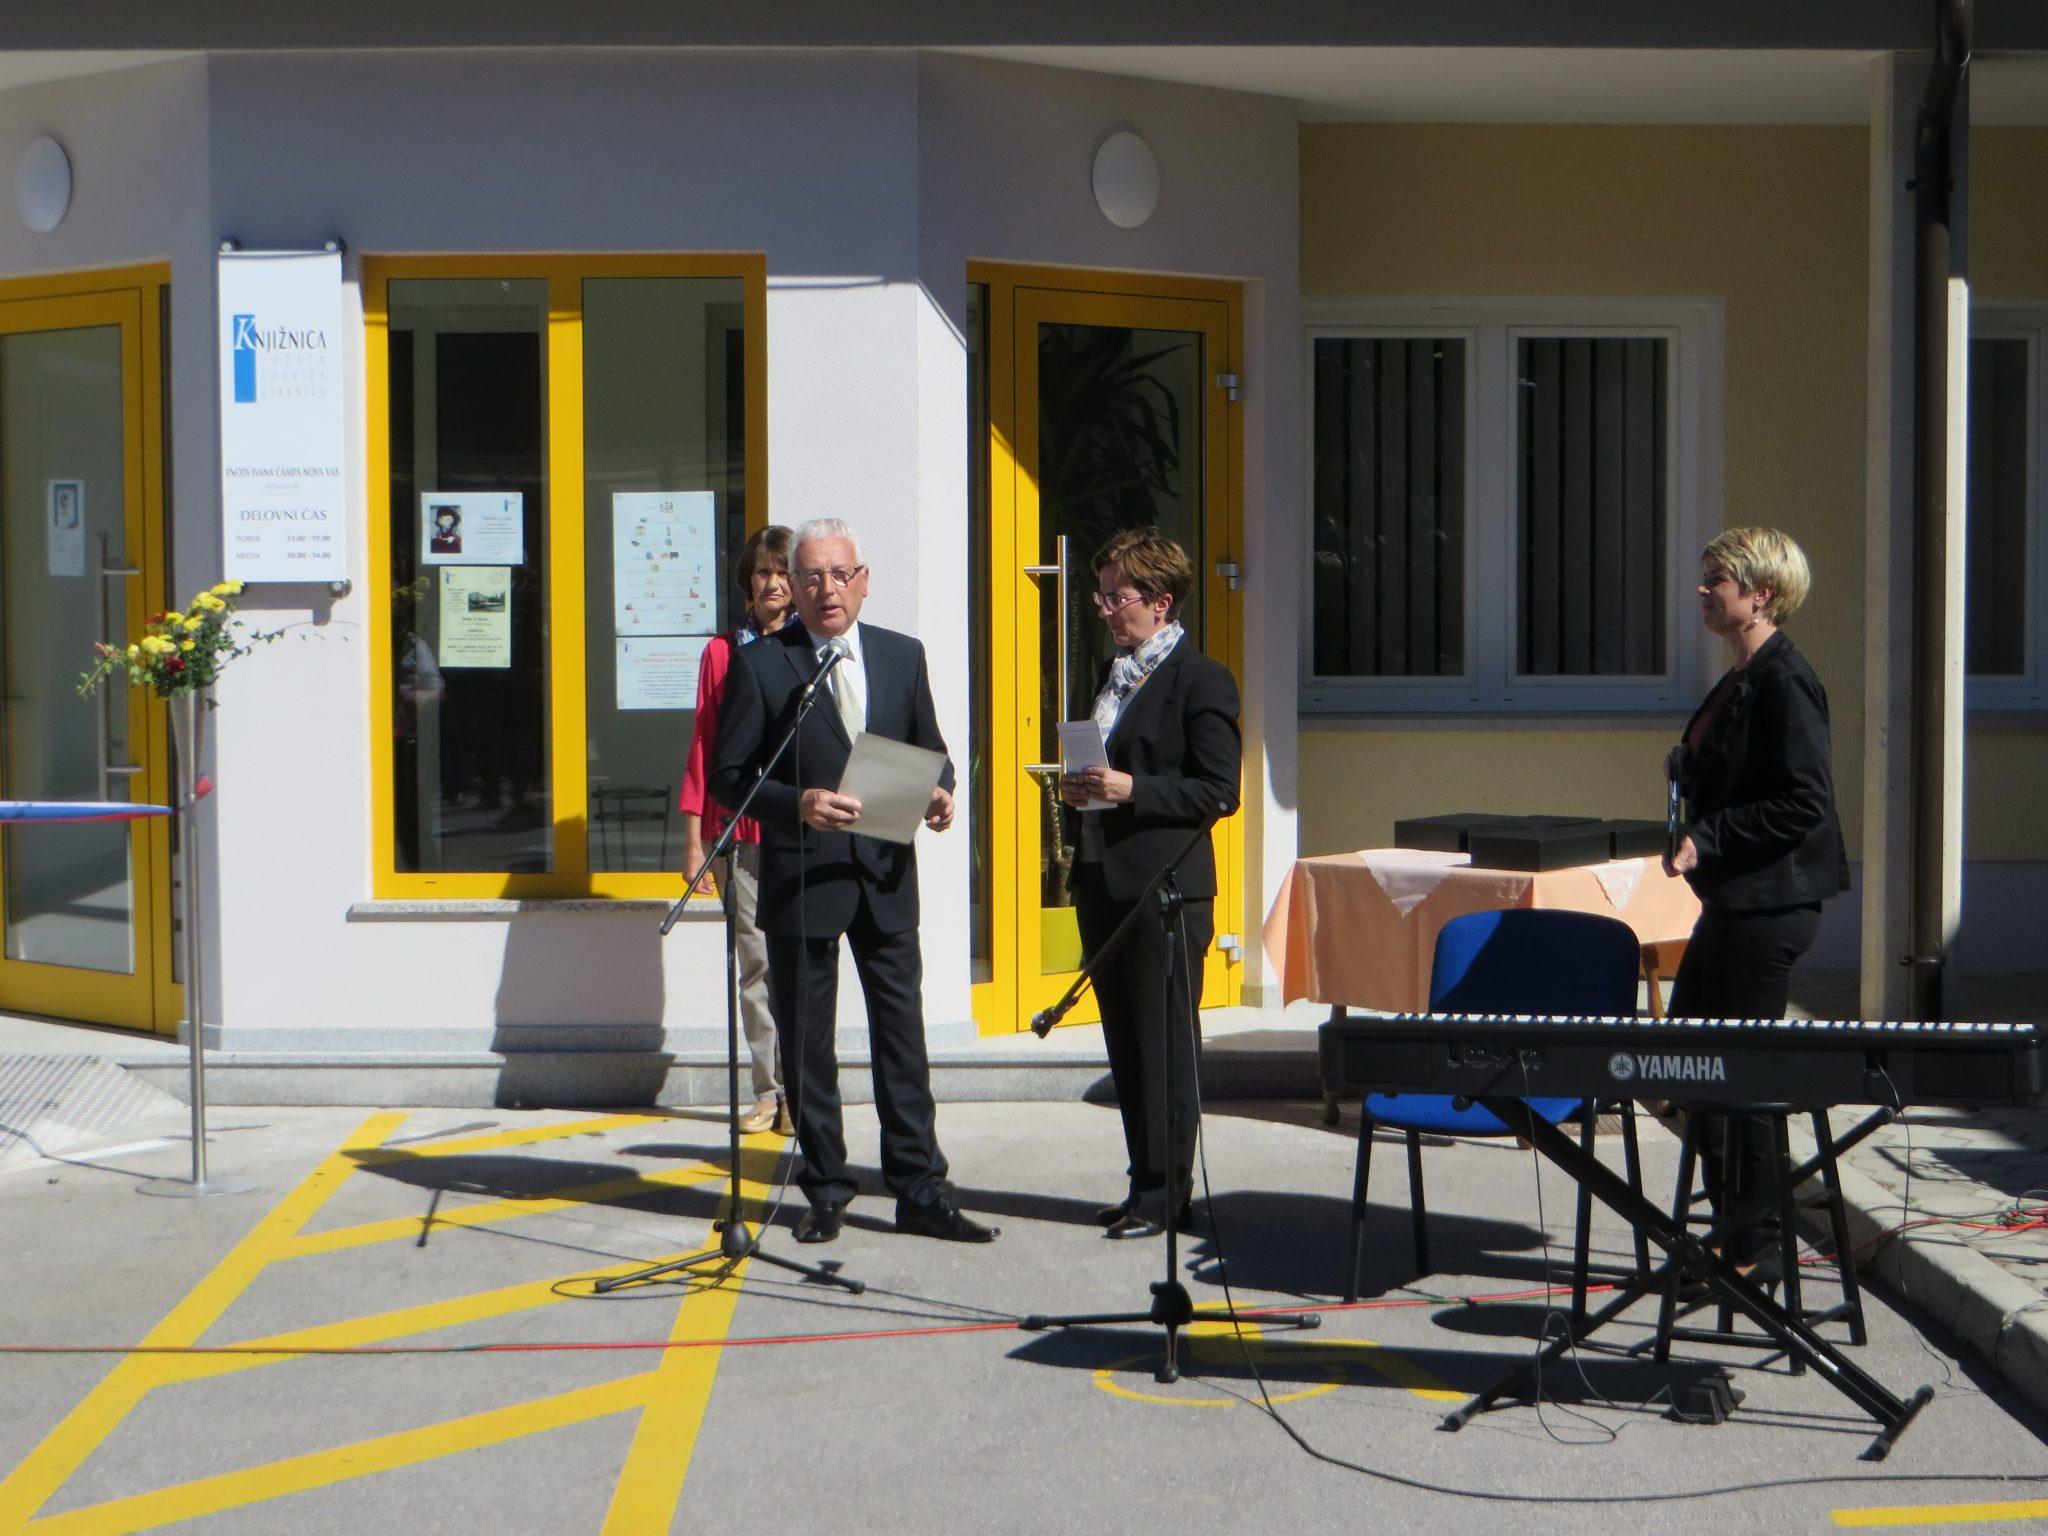 IMG 5298 - Odprtje novih prostorov KJUC – Enota Ivana Čampa Nova vas